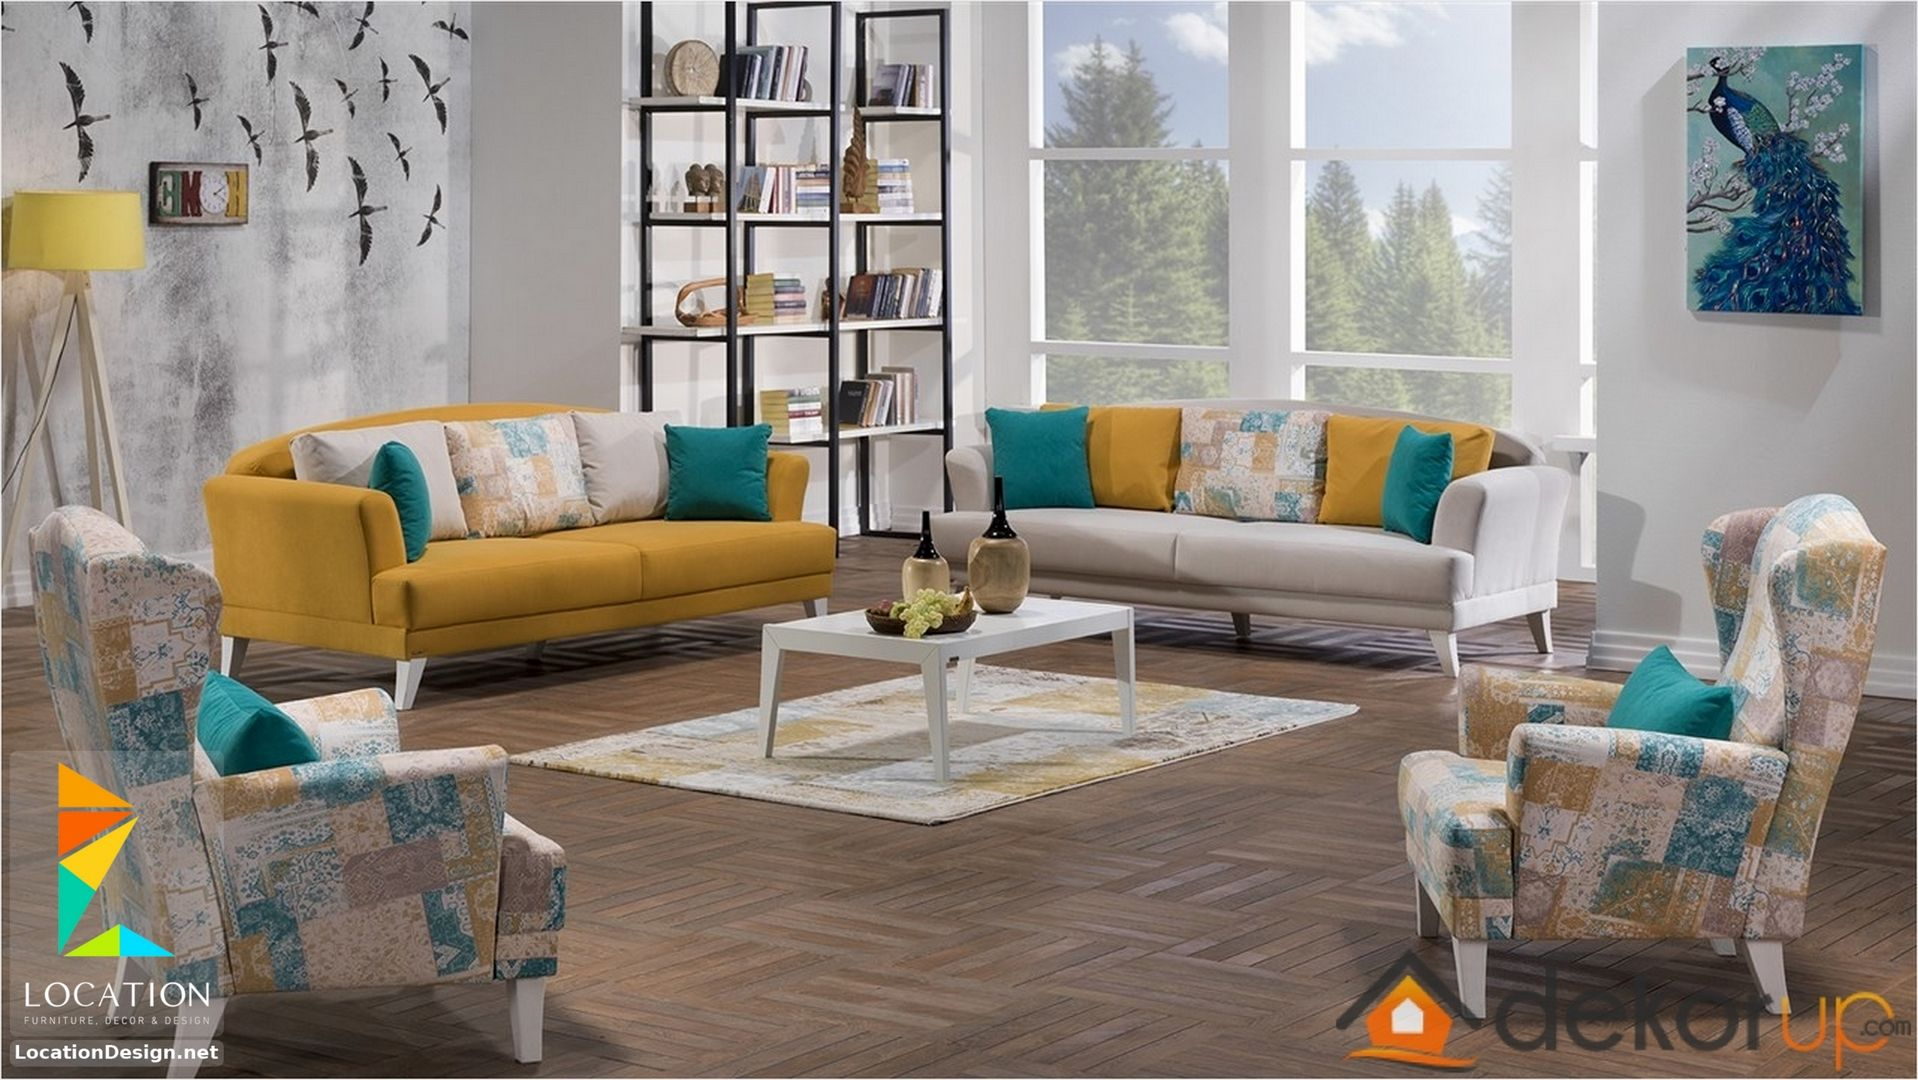 كتالوج صور انتريهات إيكيا Ikea الجديد 2019 Modern Furniture Living Room Bedroom Design Living Room Interior